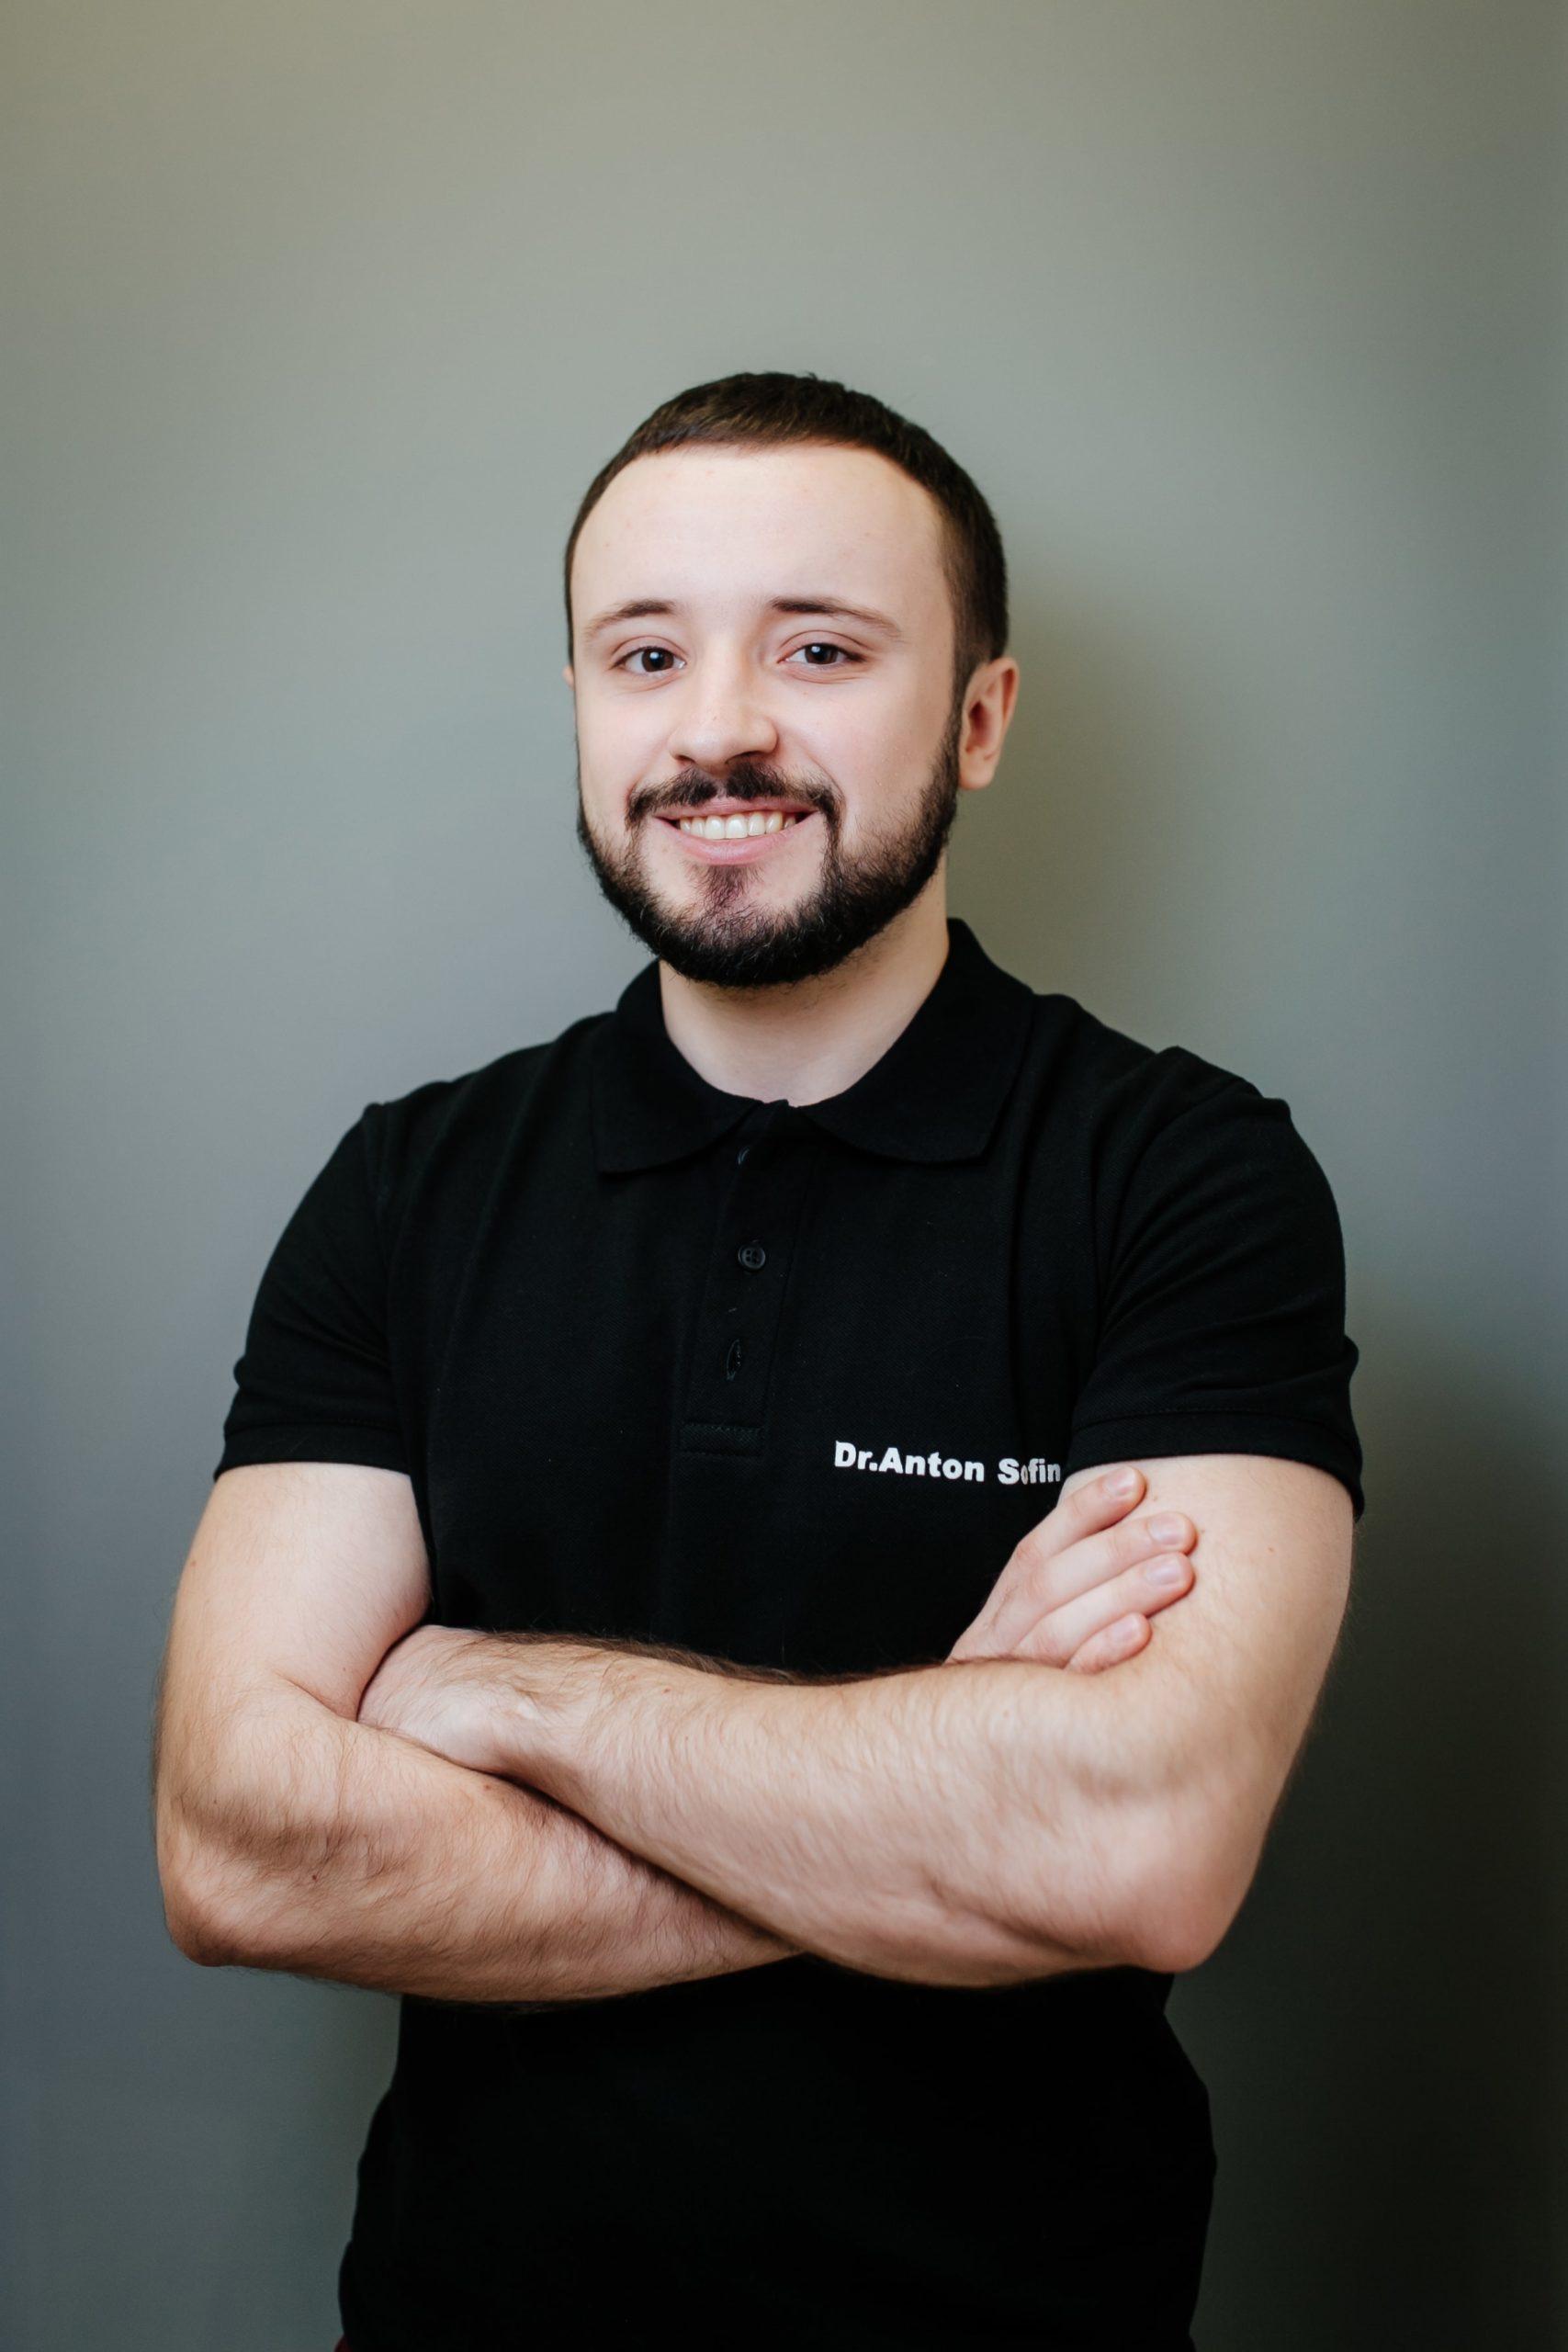 Софин Антон Сергеевич